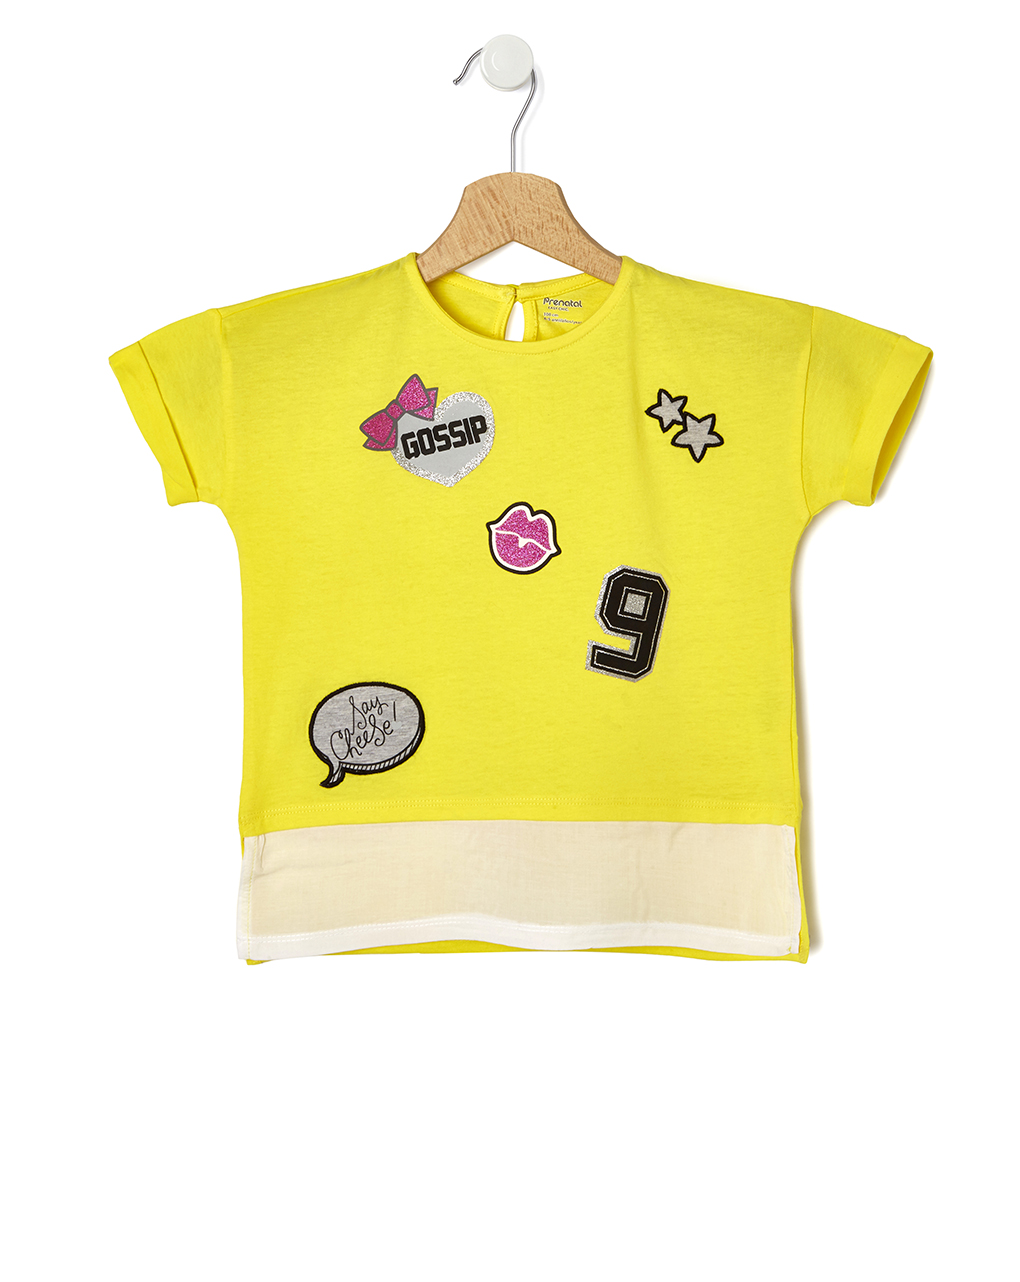 Maxi t-shirt Κίτρινο με Patch για Κορίτσι